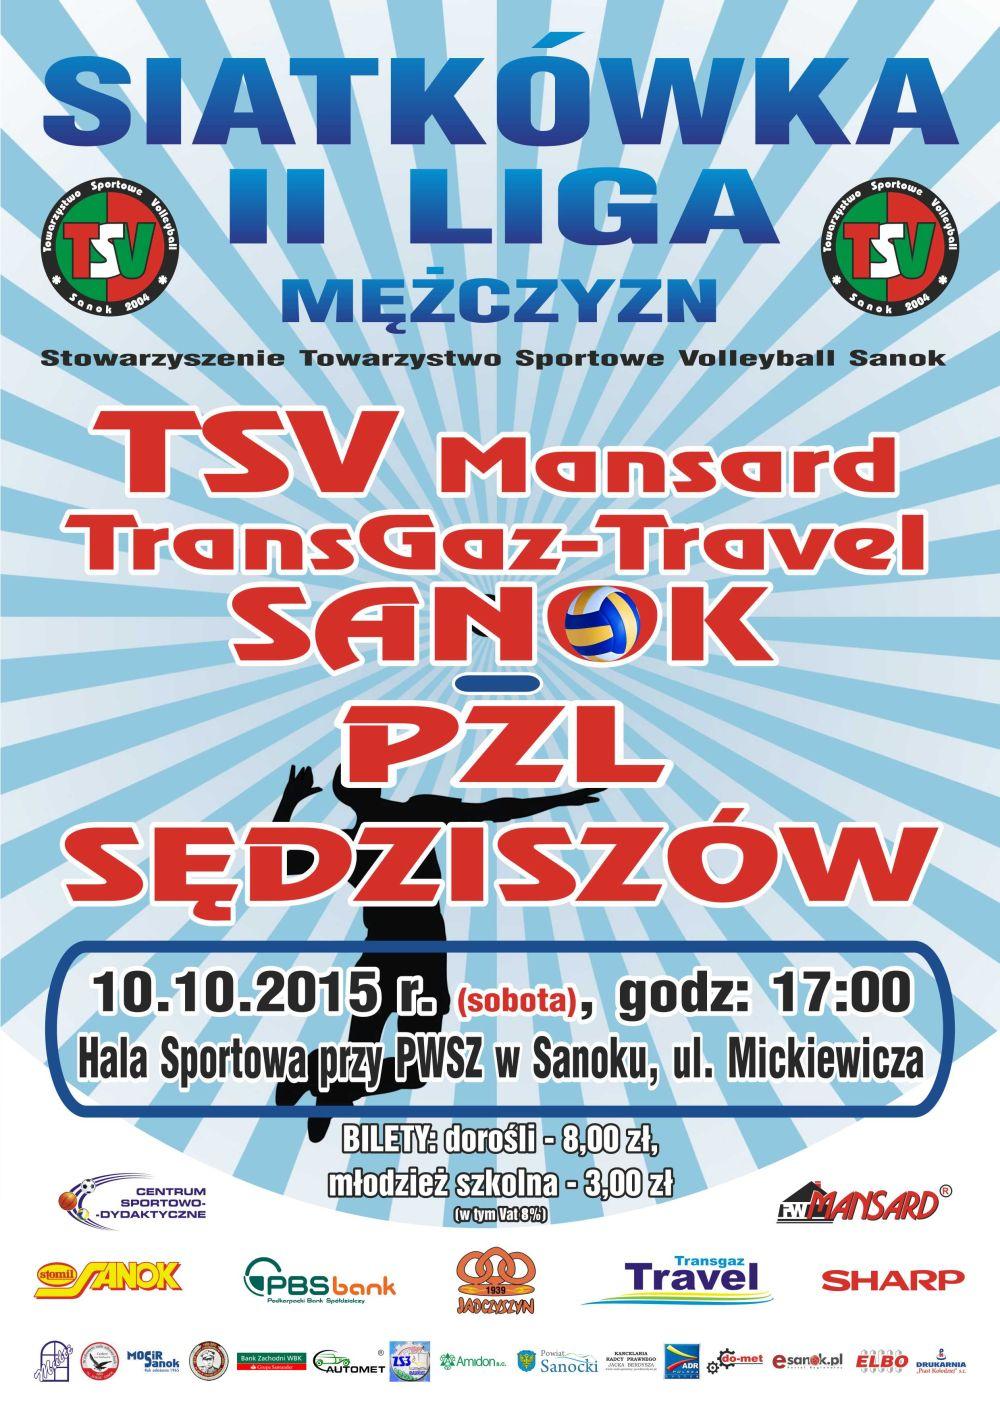 TSV Plakat A2_PZL Sedziszow